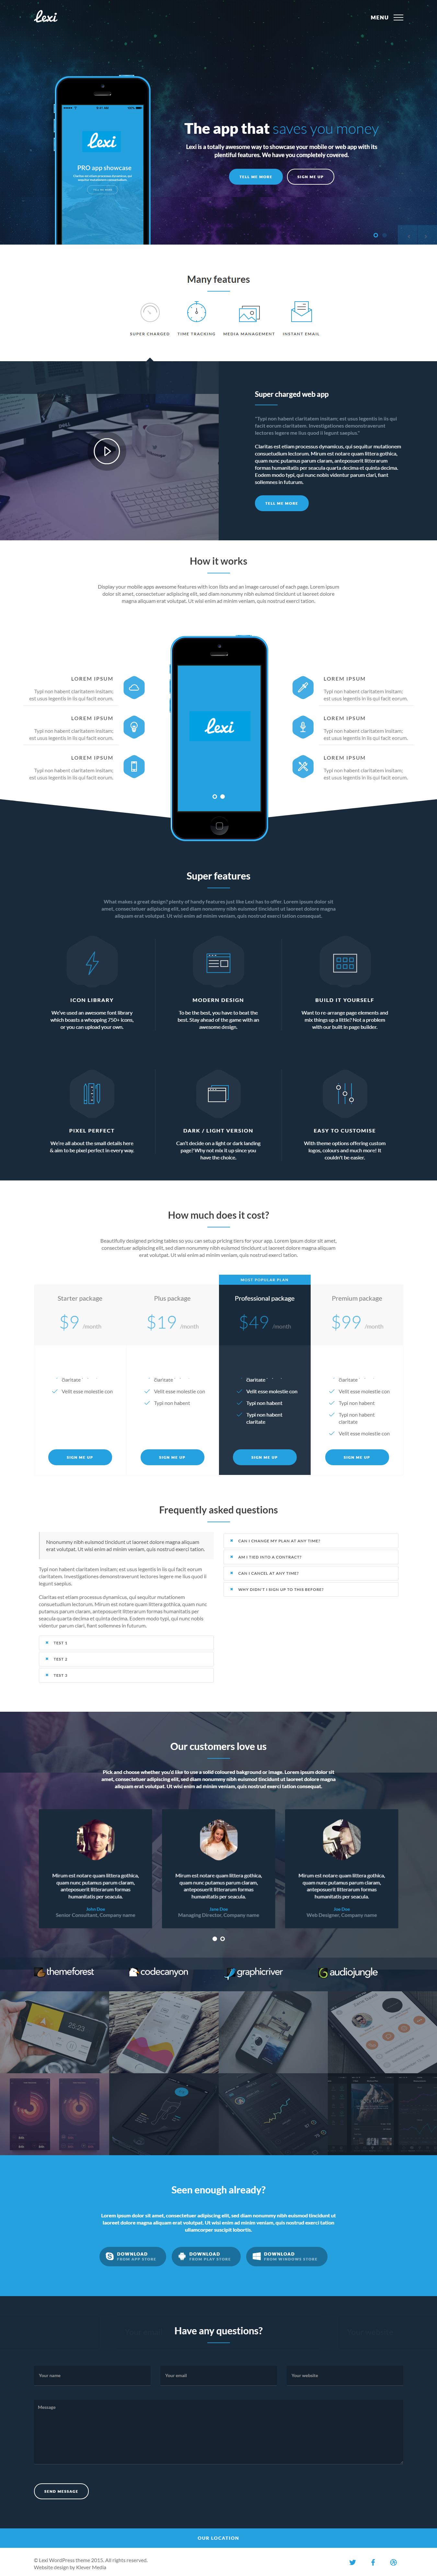 lexi best premium mobile app wordpress theme - 10+ Best Premium Mobile App WordPress Themes